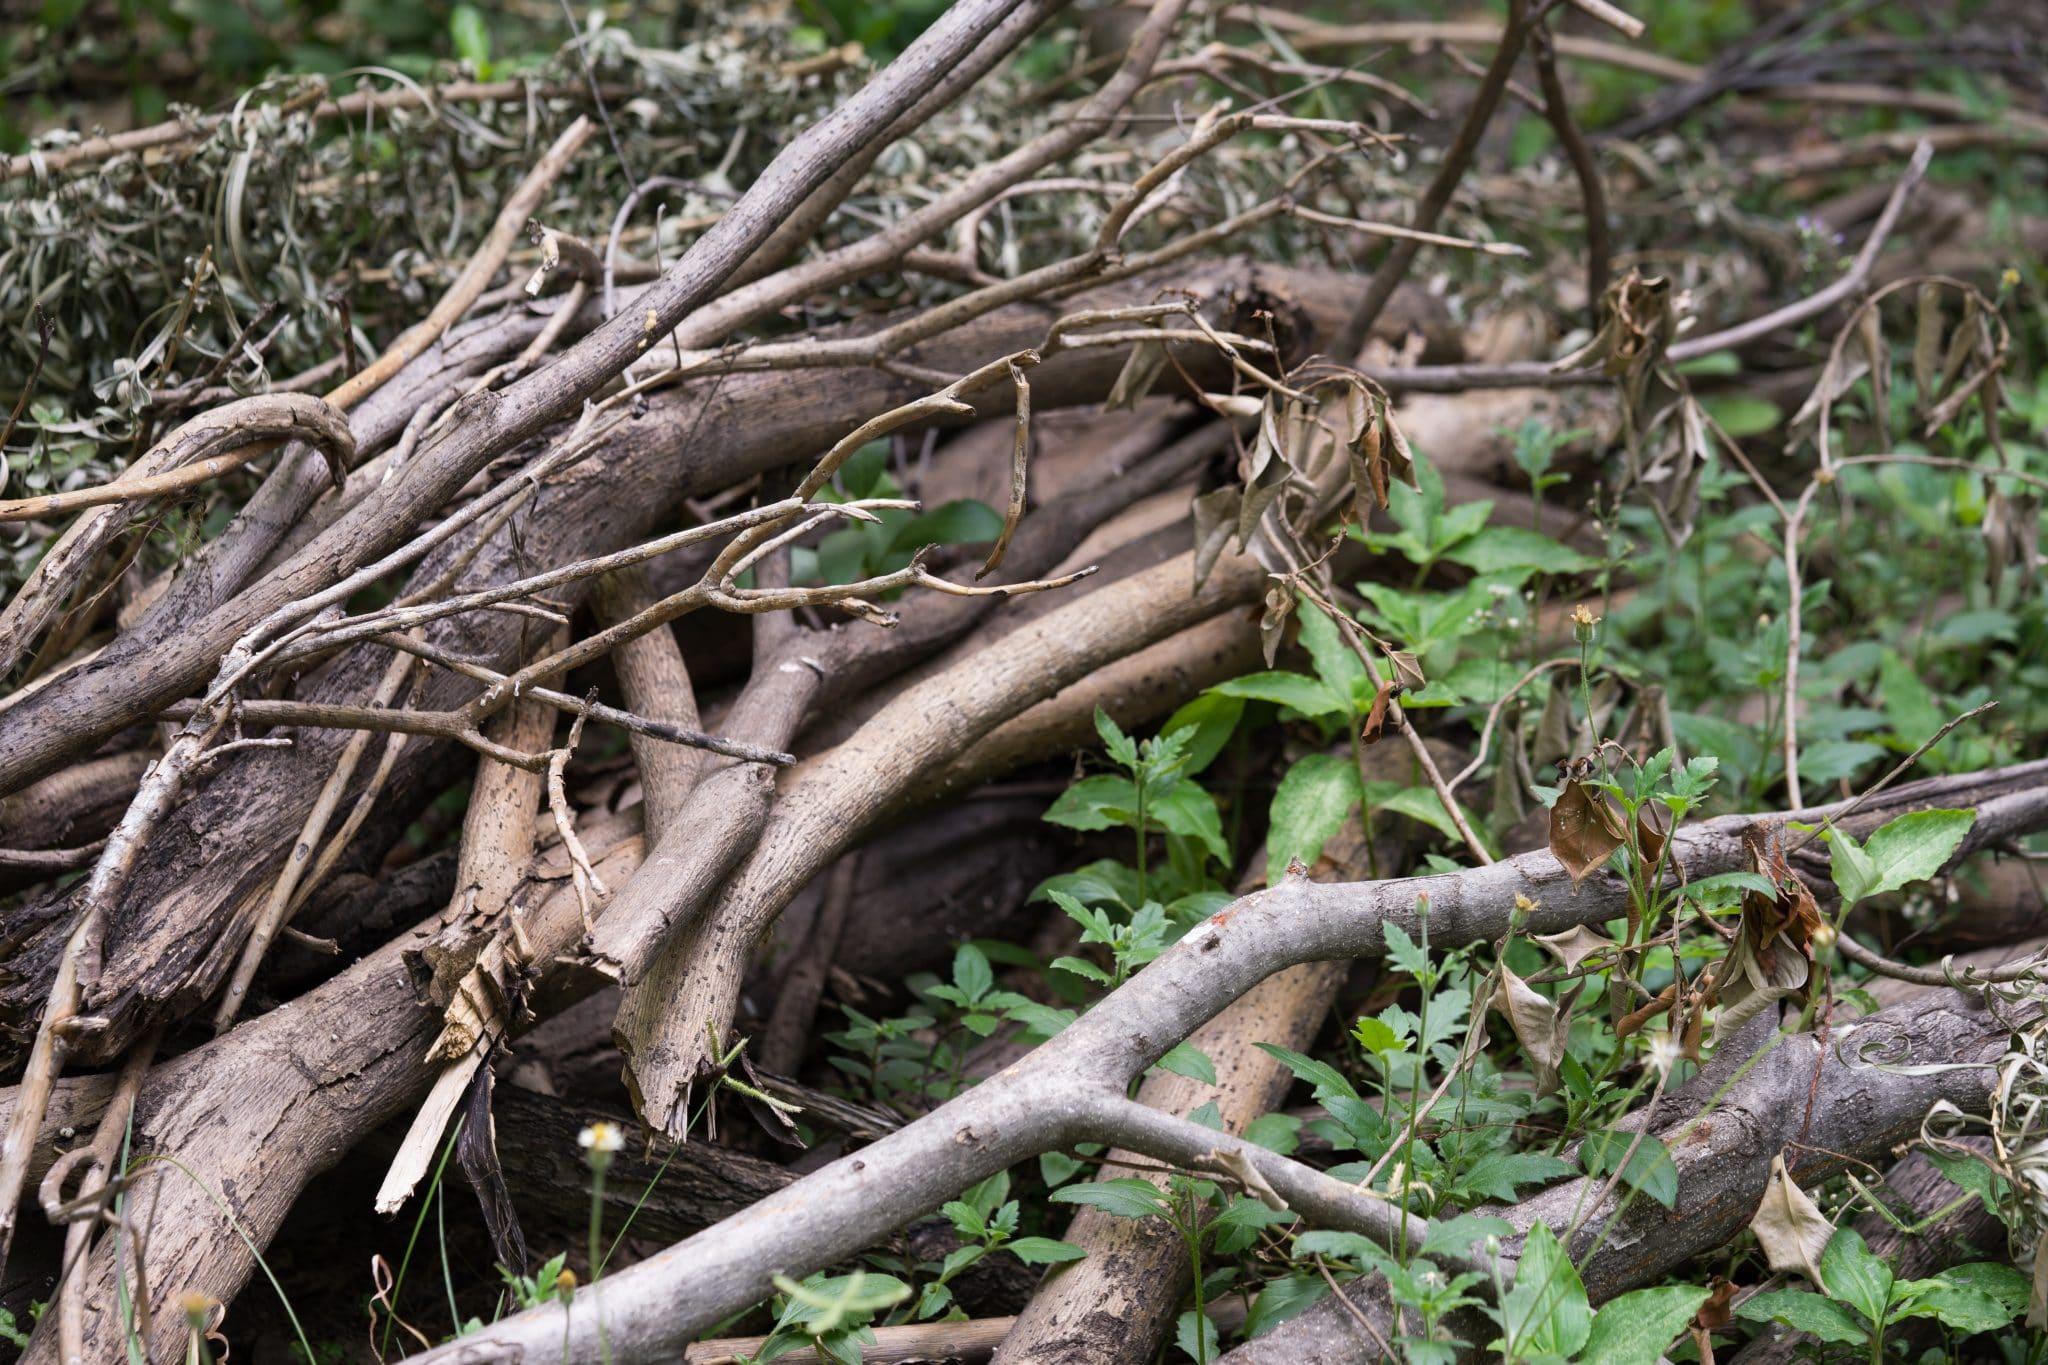 City organizes tree limb pick-up services following Saturday's storm